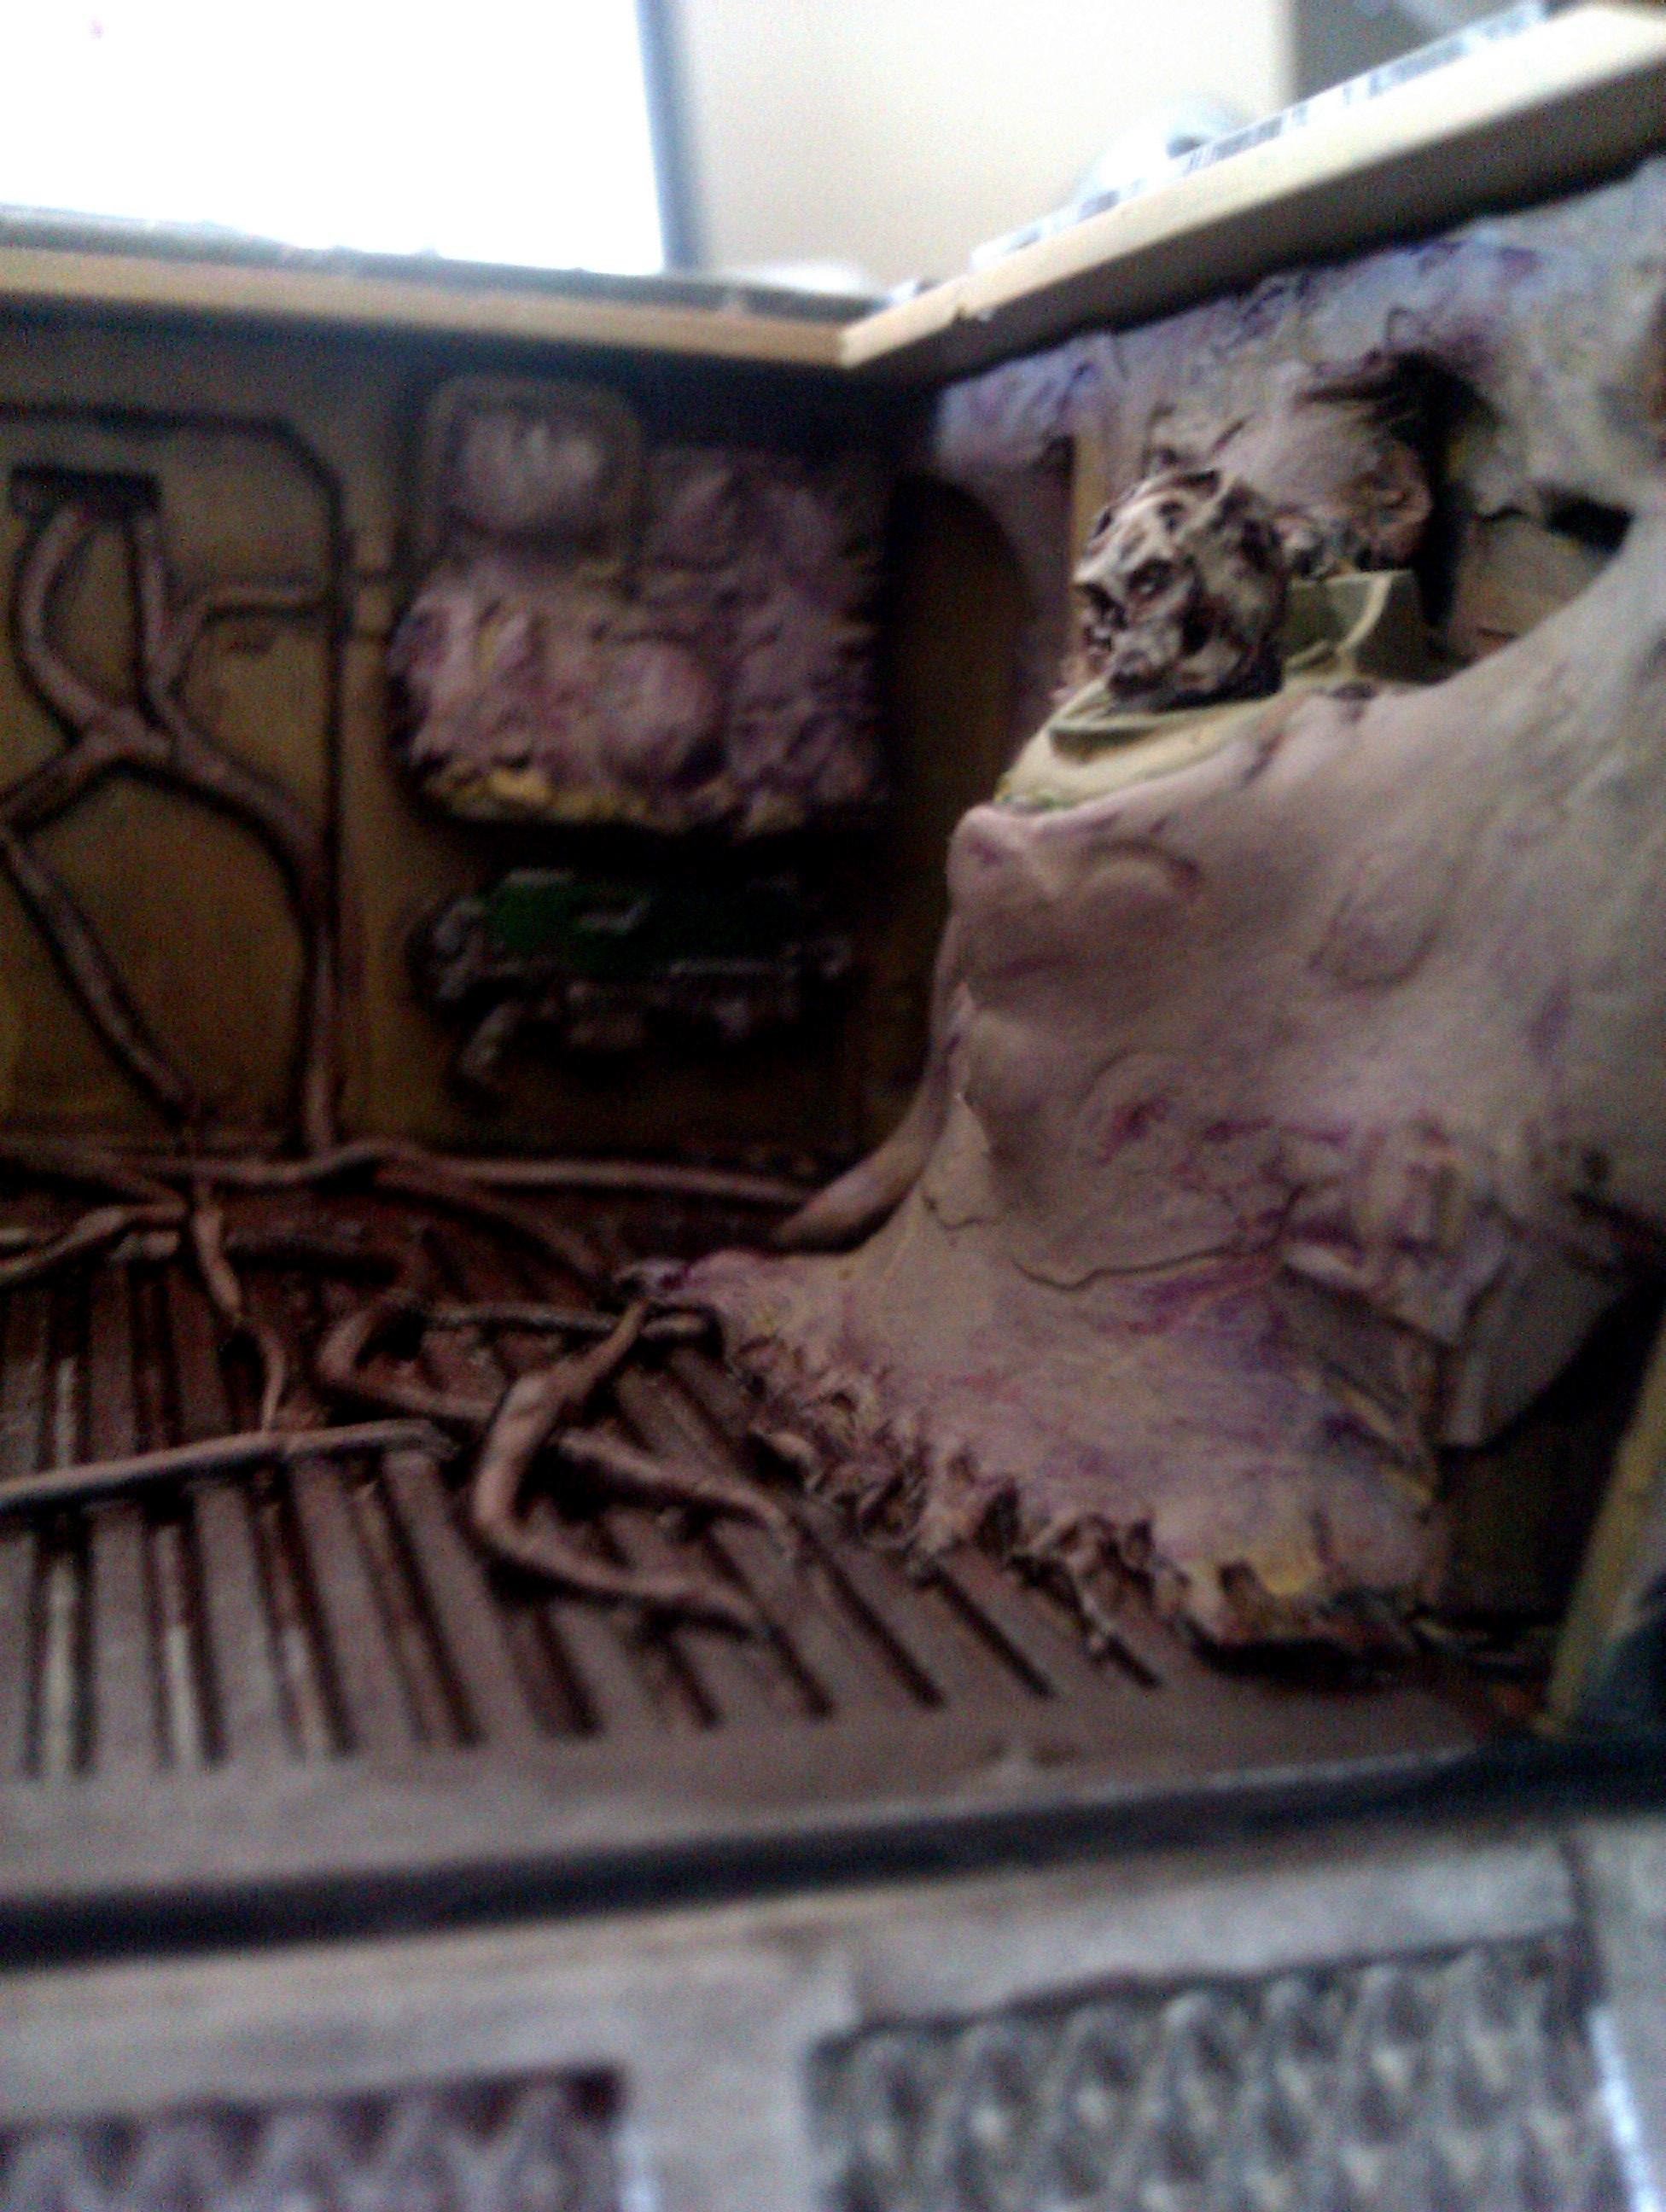 Chaos, Inside, Interior, Nurgle, Rhino, Space, Space Marines